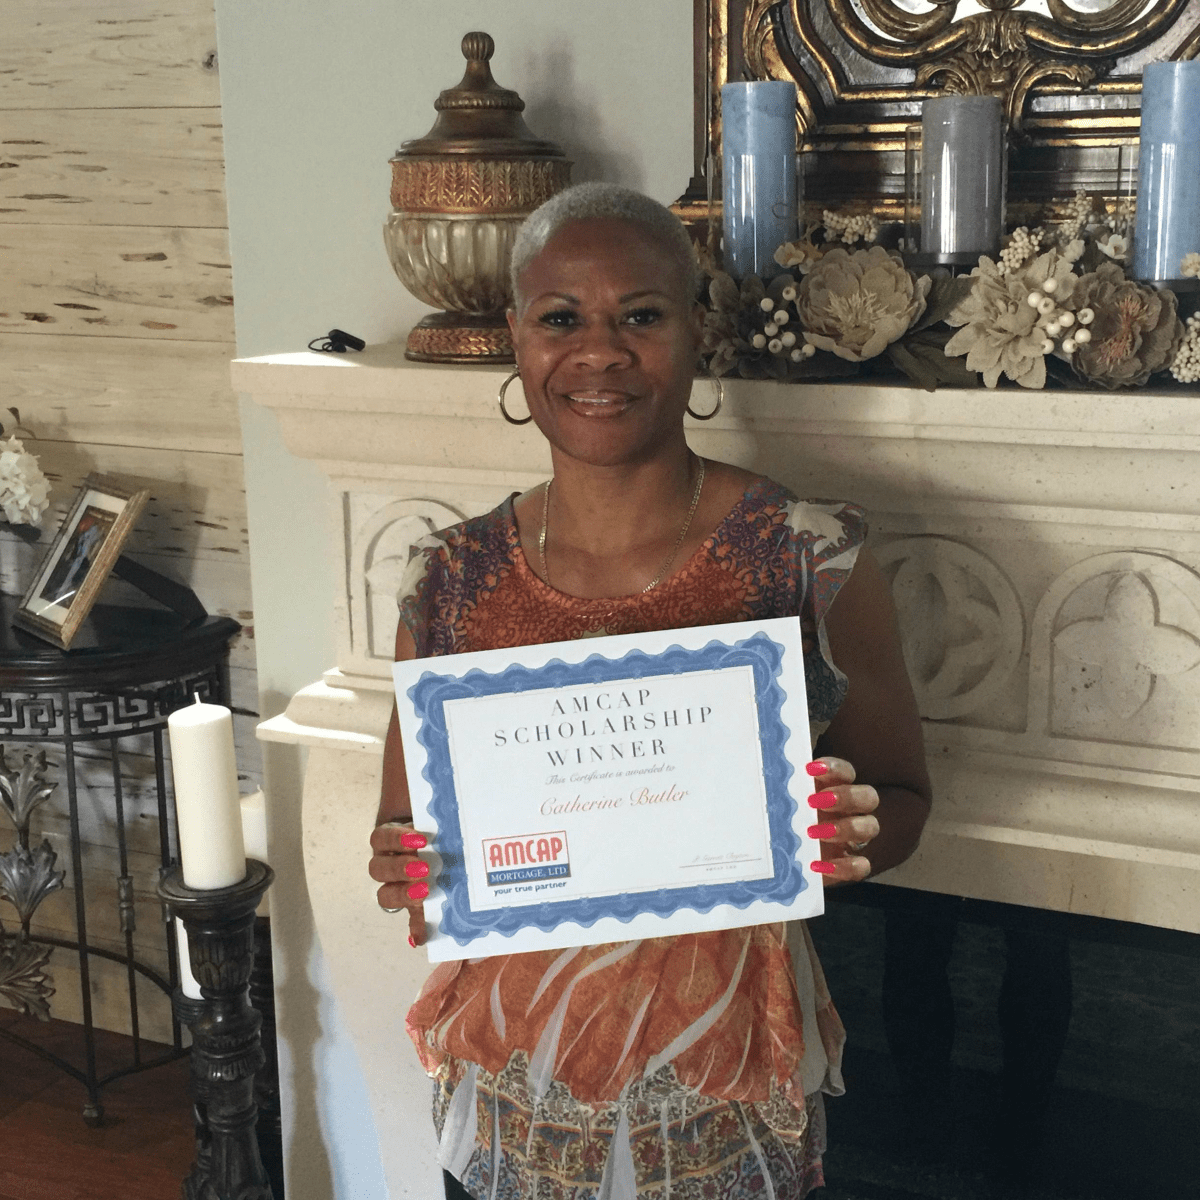 AmCap scholarship winner Catherine Butler